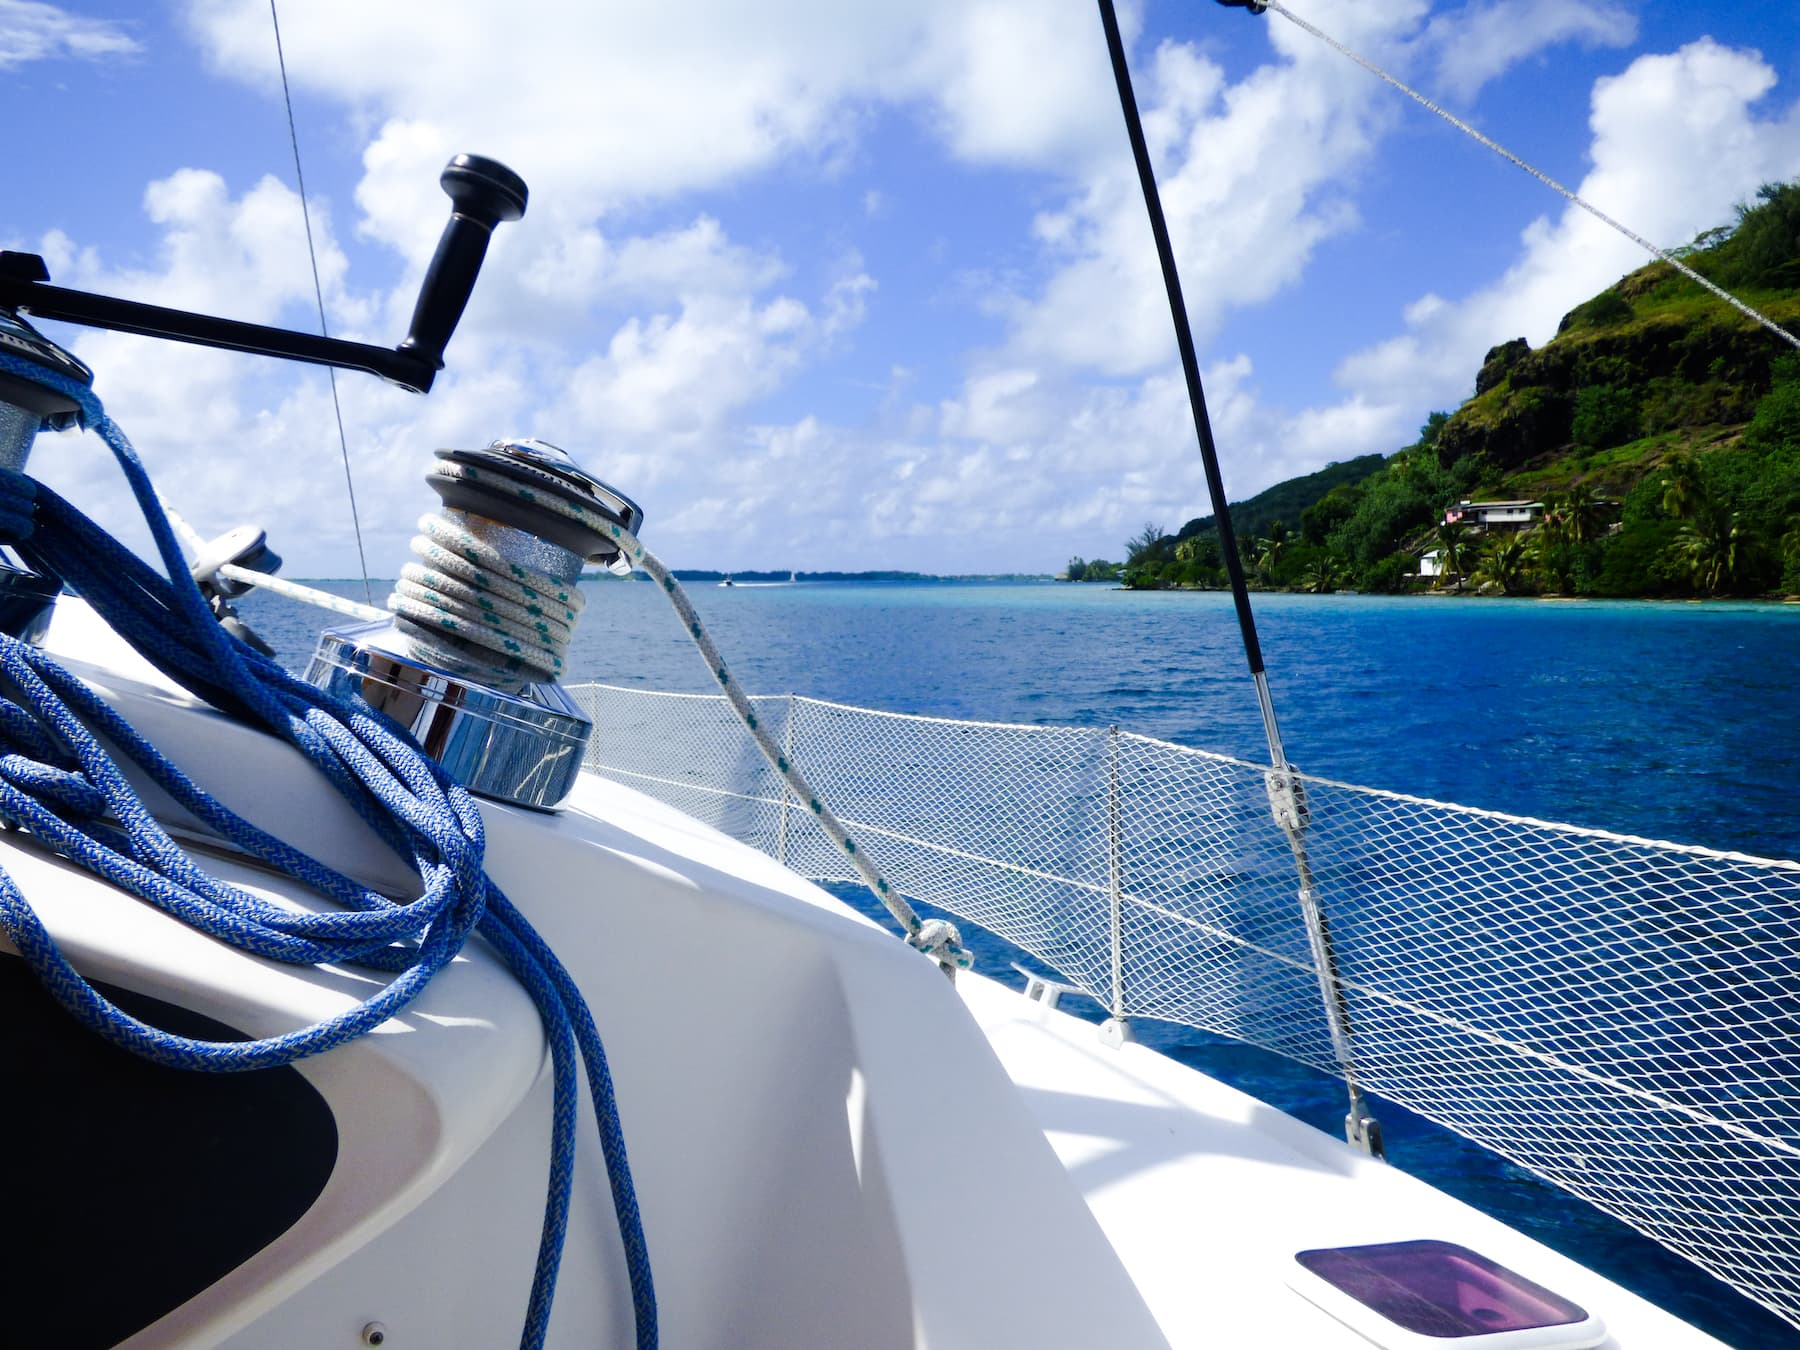 https://tahititourisme.com/wp-content/uploads/2017/08/bateau-tlc-modif-13.jpg